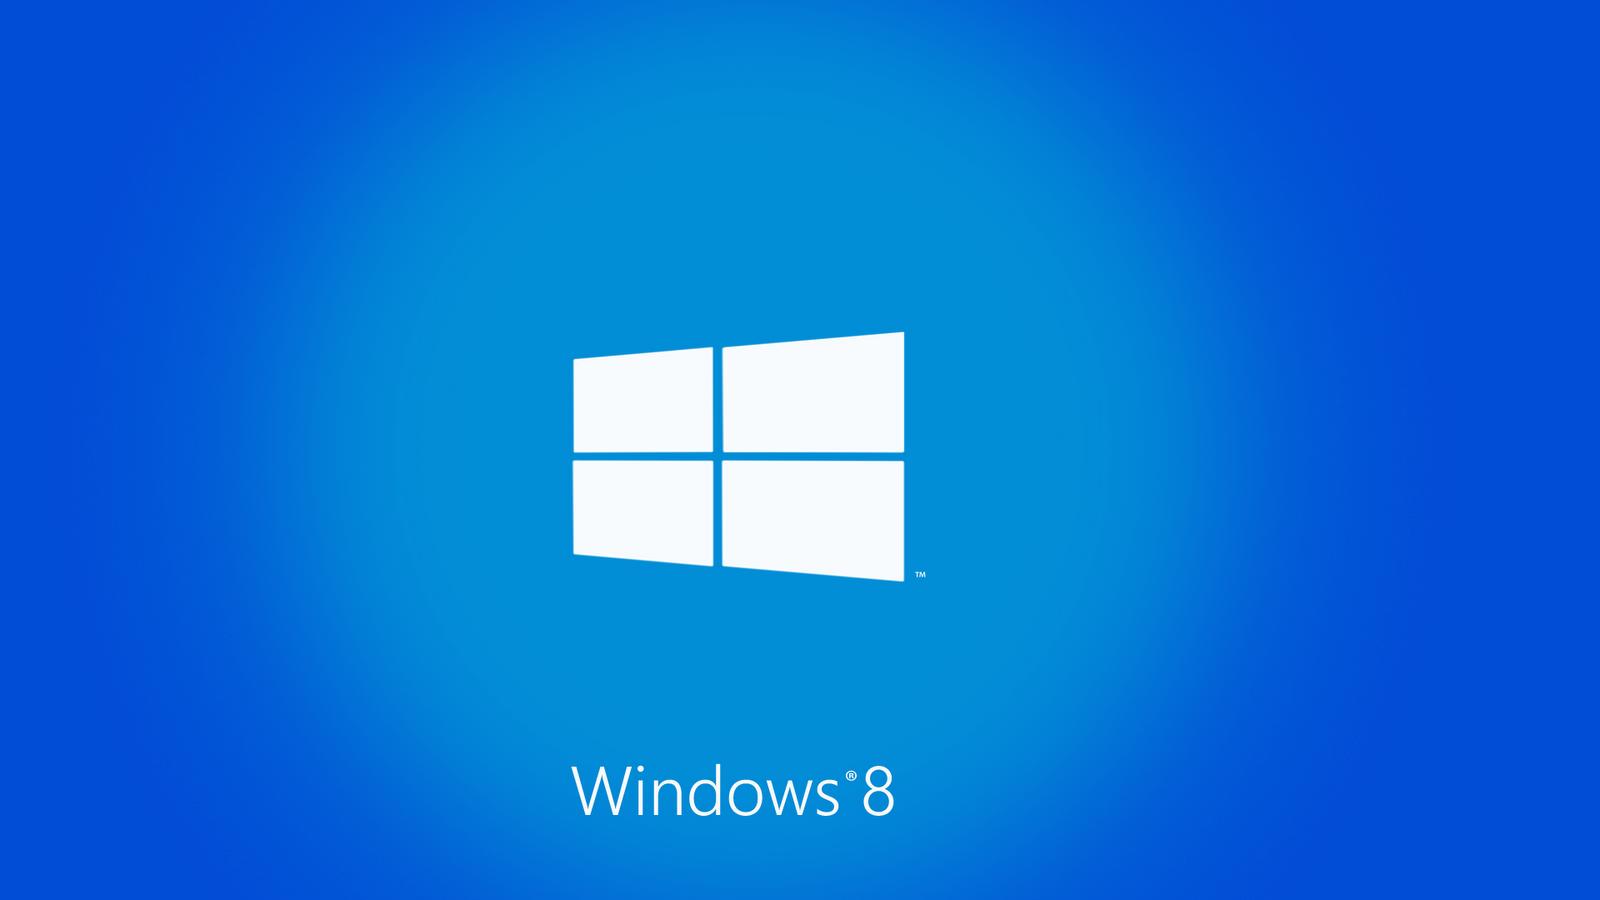 Windows 8 Wallpapers Release: Best Windows 8 Desktop Wallpaper